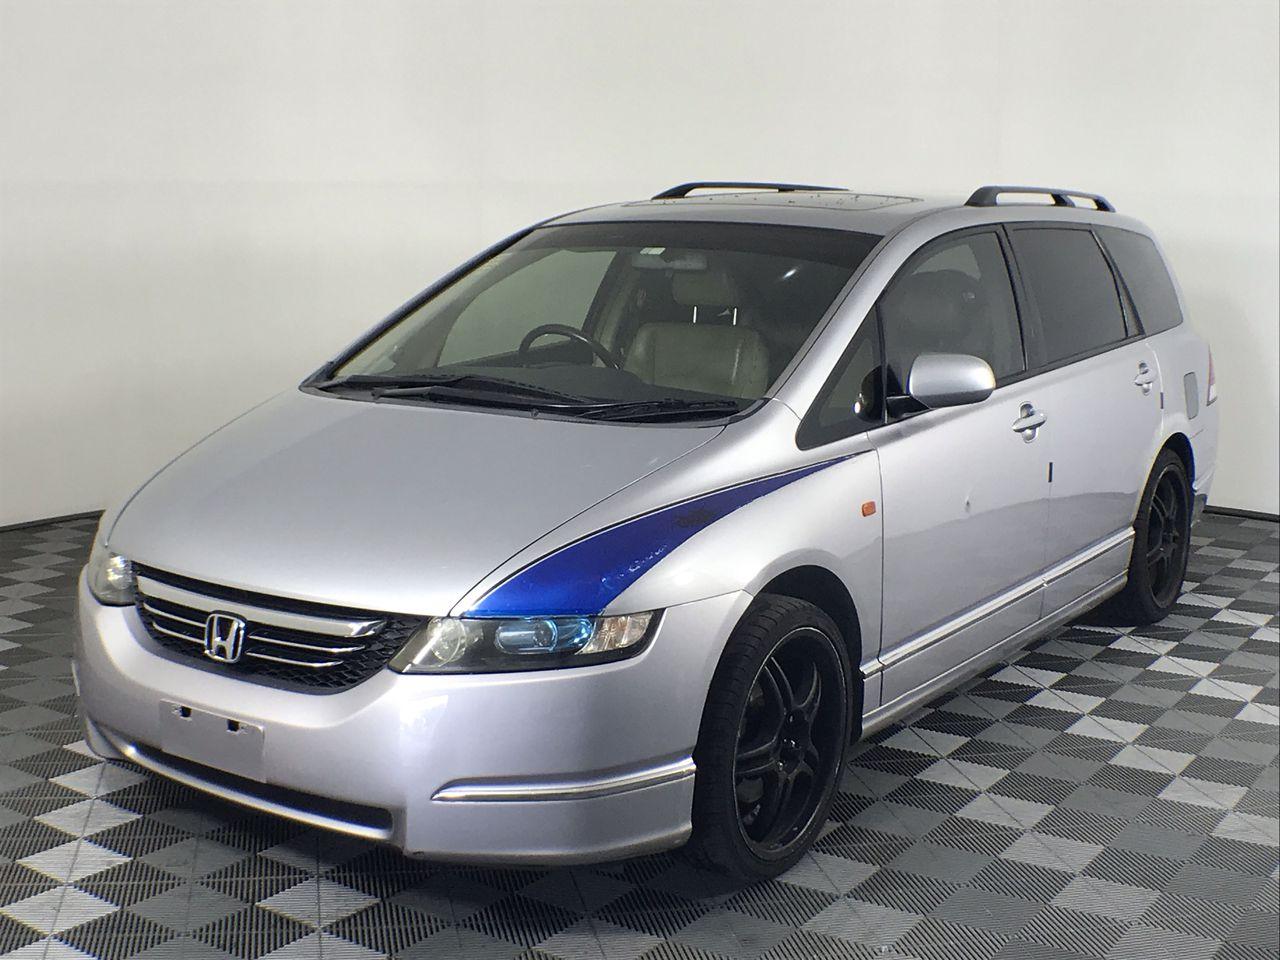 2004 Honda Odyssey Luxury Automatic 7 Seats People Mover